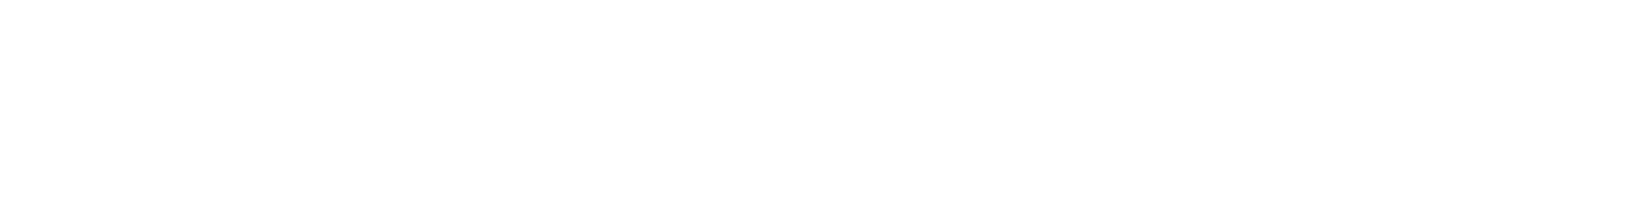 Ledger logo wht (2).png